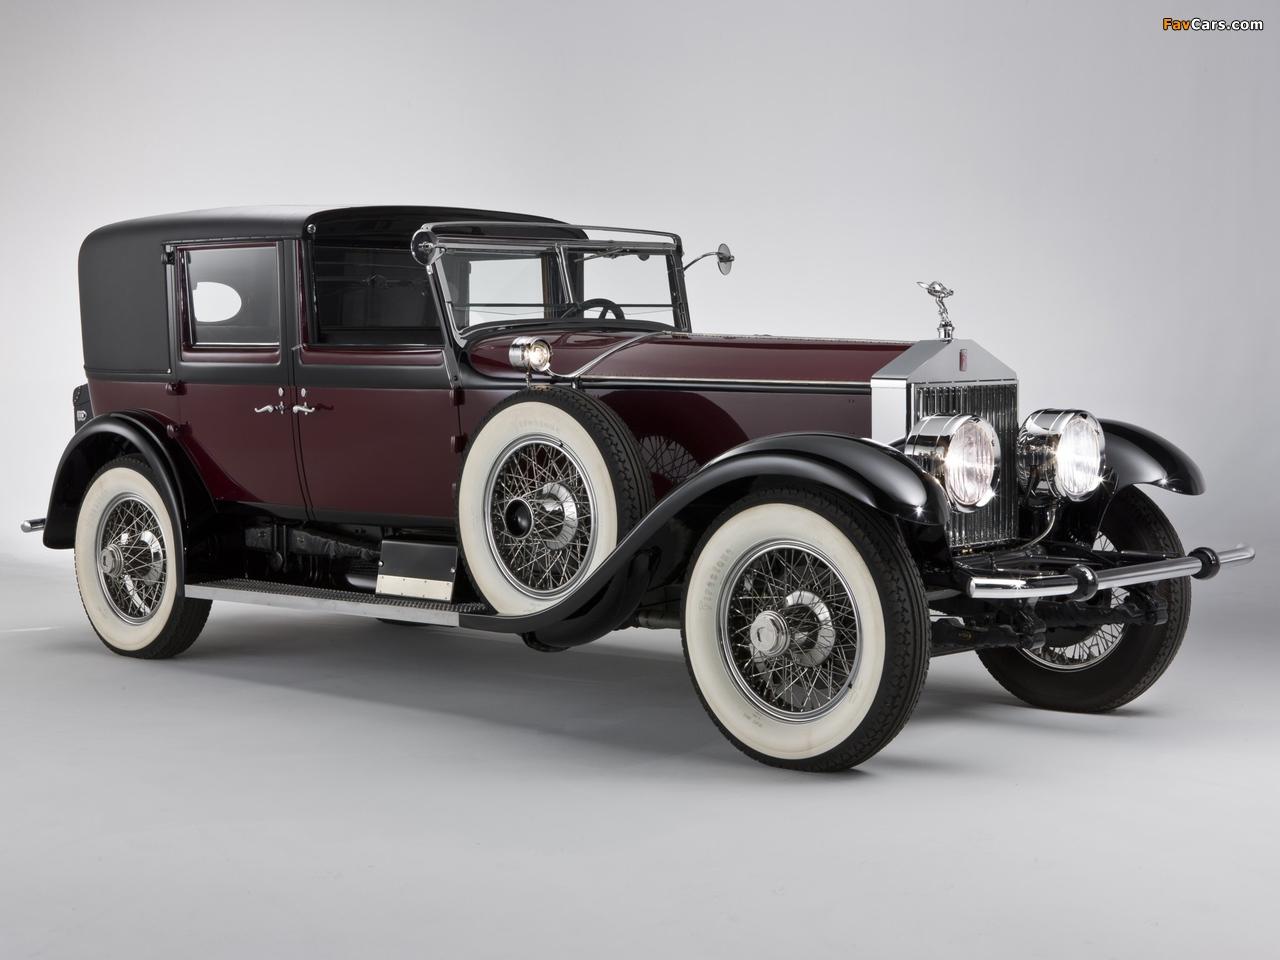 Rolls-Royce Springfield Phantom I Town Car by Hibbard & Darrin 1928 photos (1280 x 960)